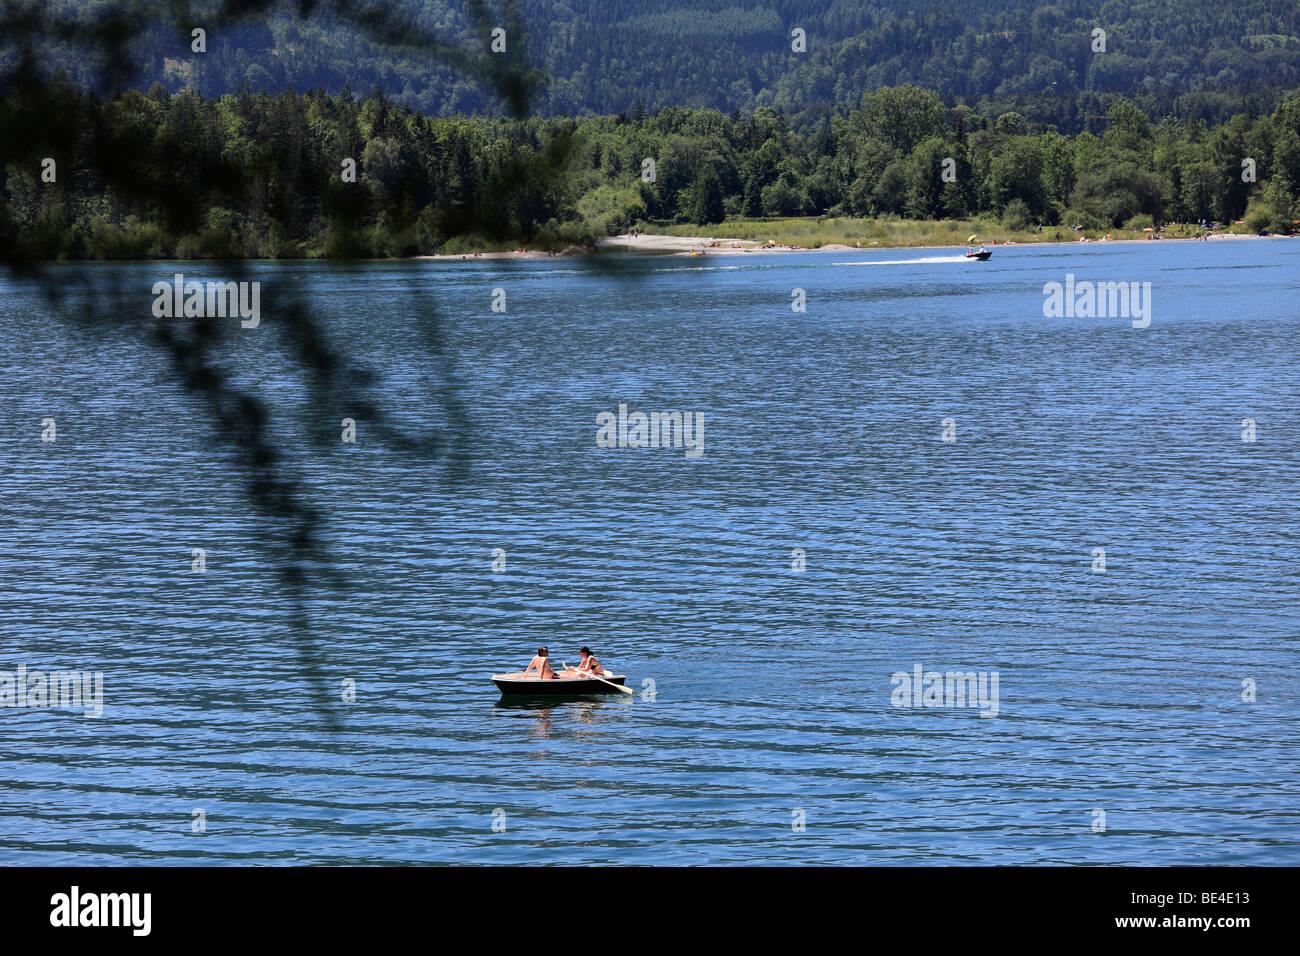 Rowboat on Wolfgangsee lake, St. Wolfgang, Salzkammergut region, Upper Austria, Austria, Europe - Stock Image